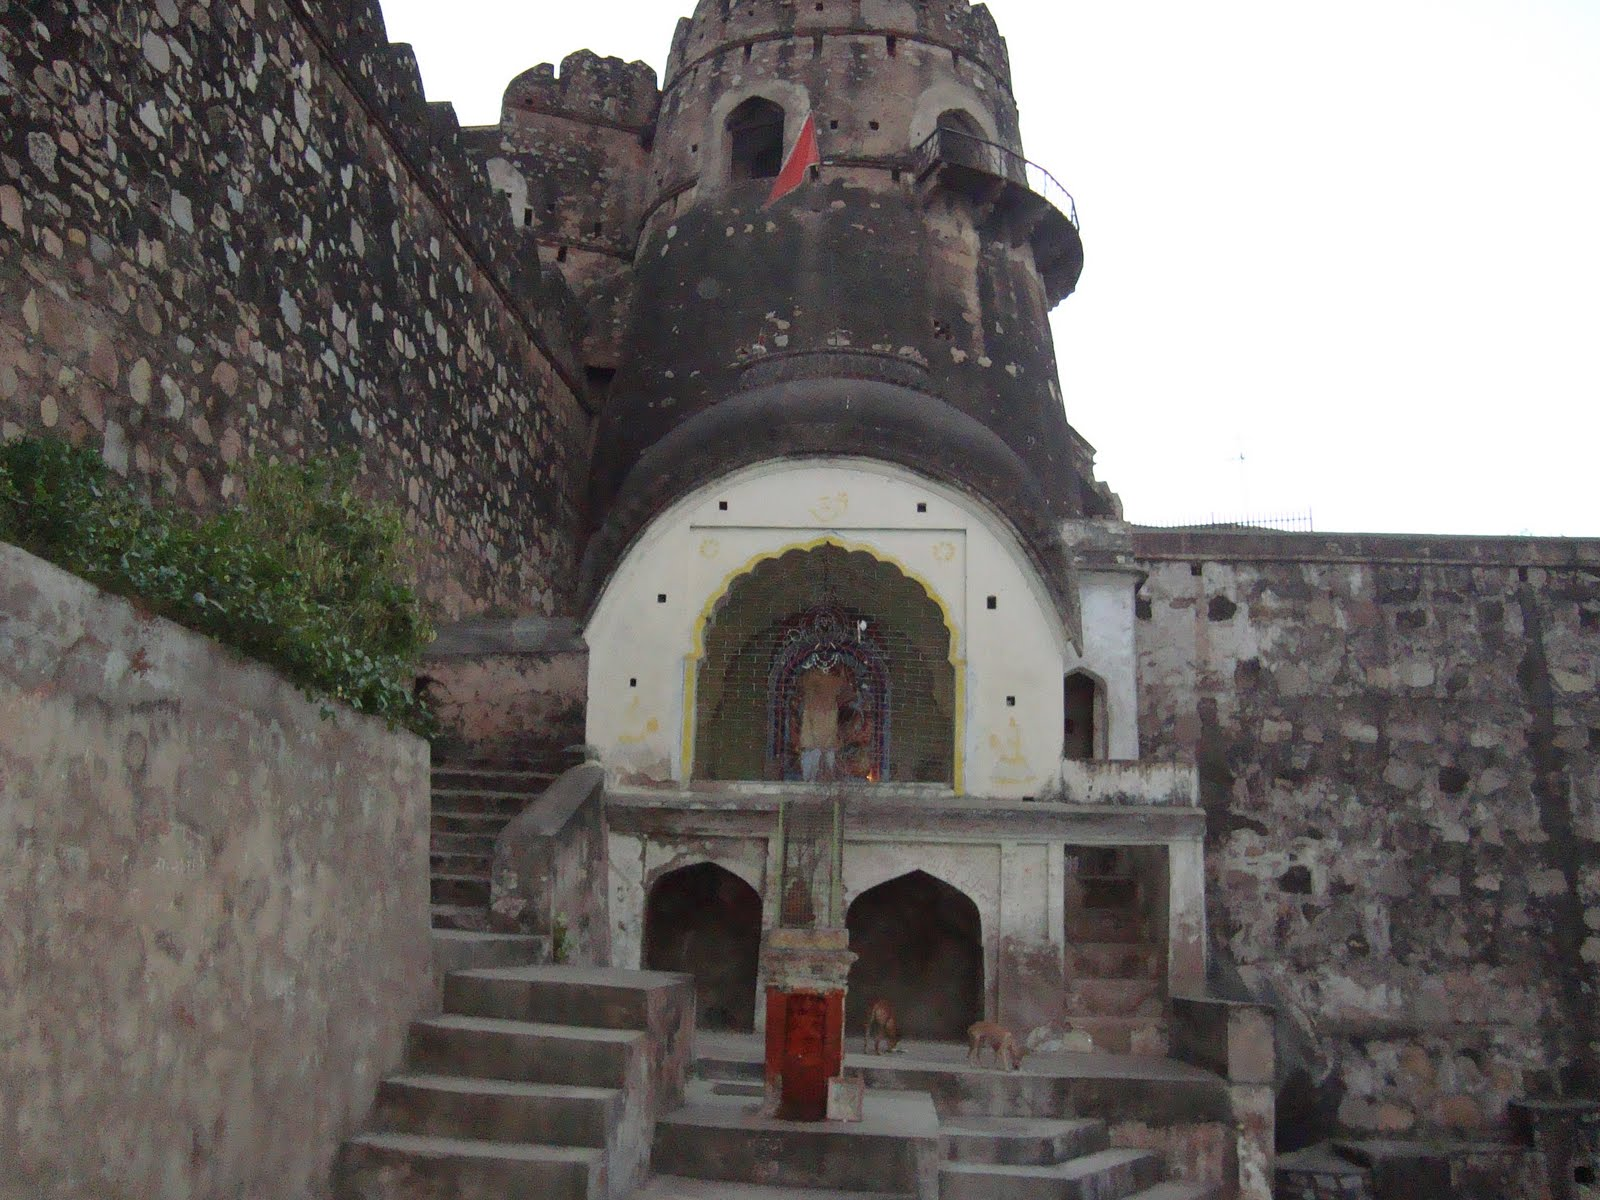 Jhansi Fort Inside View - Rani Lakshmi Bai Original Palace , HD Wallpaper & Backgrounds